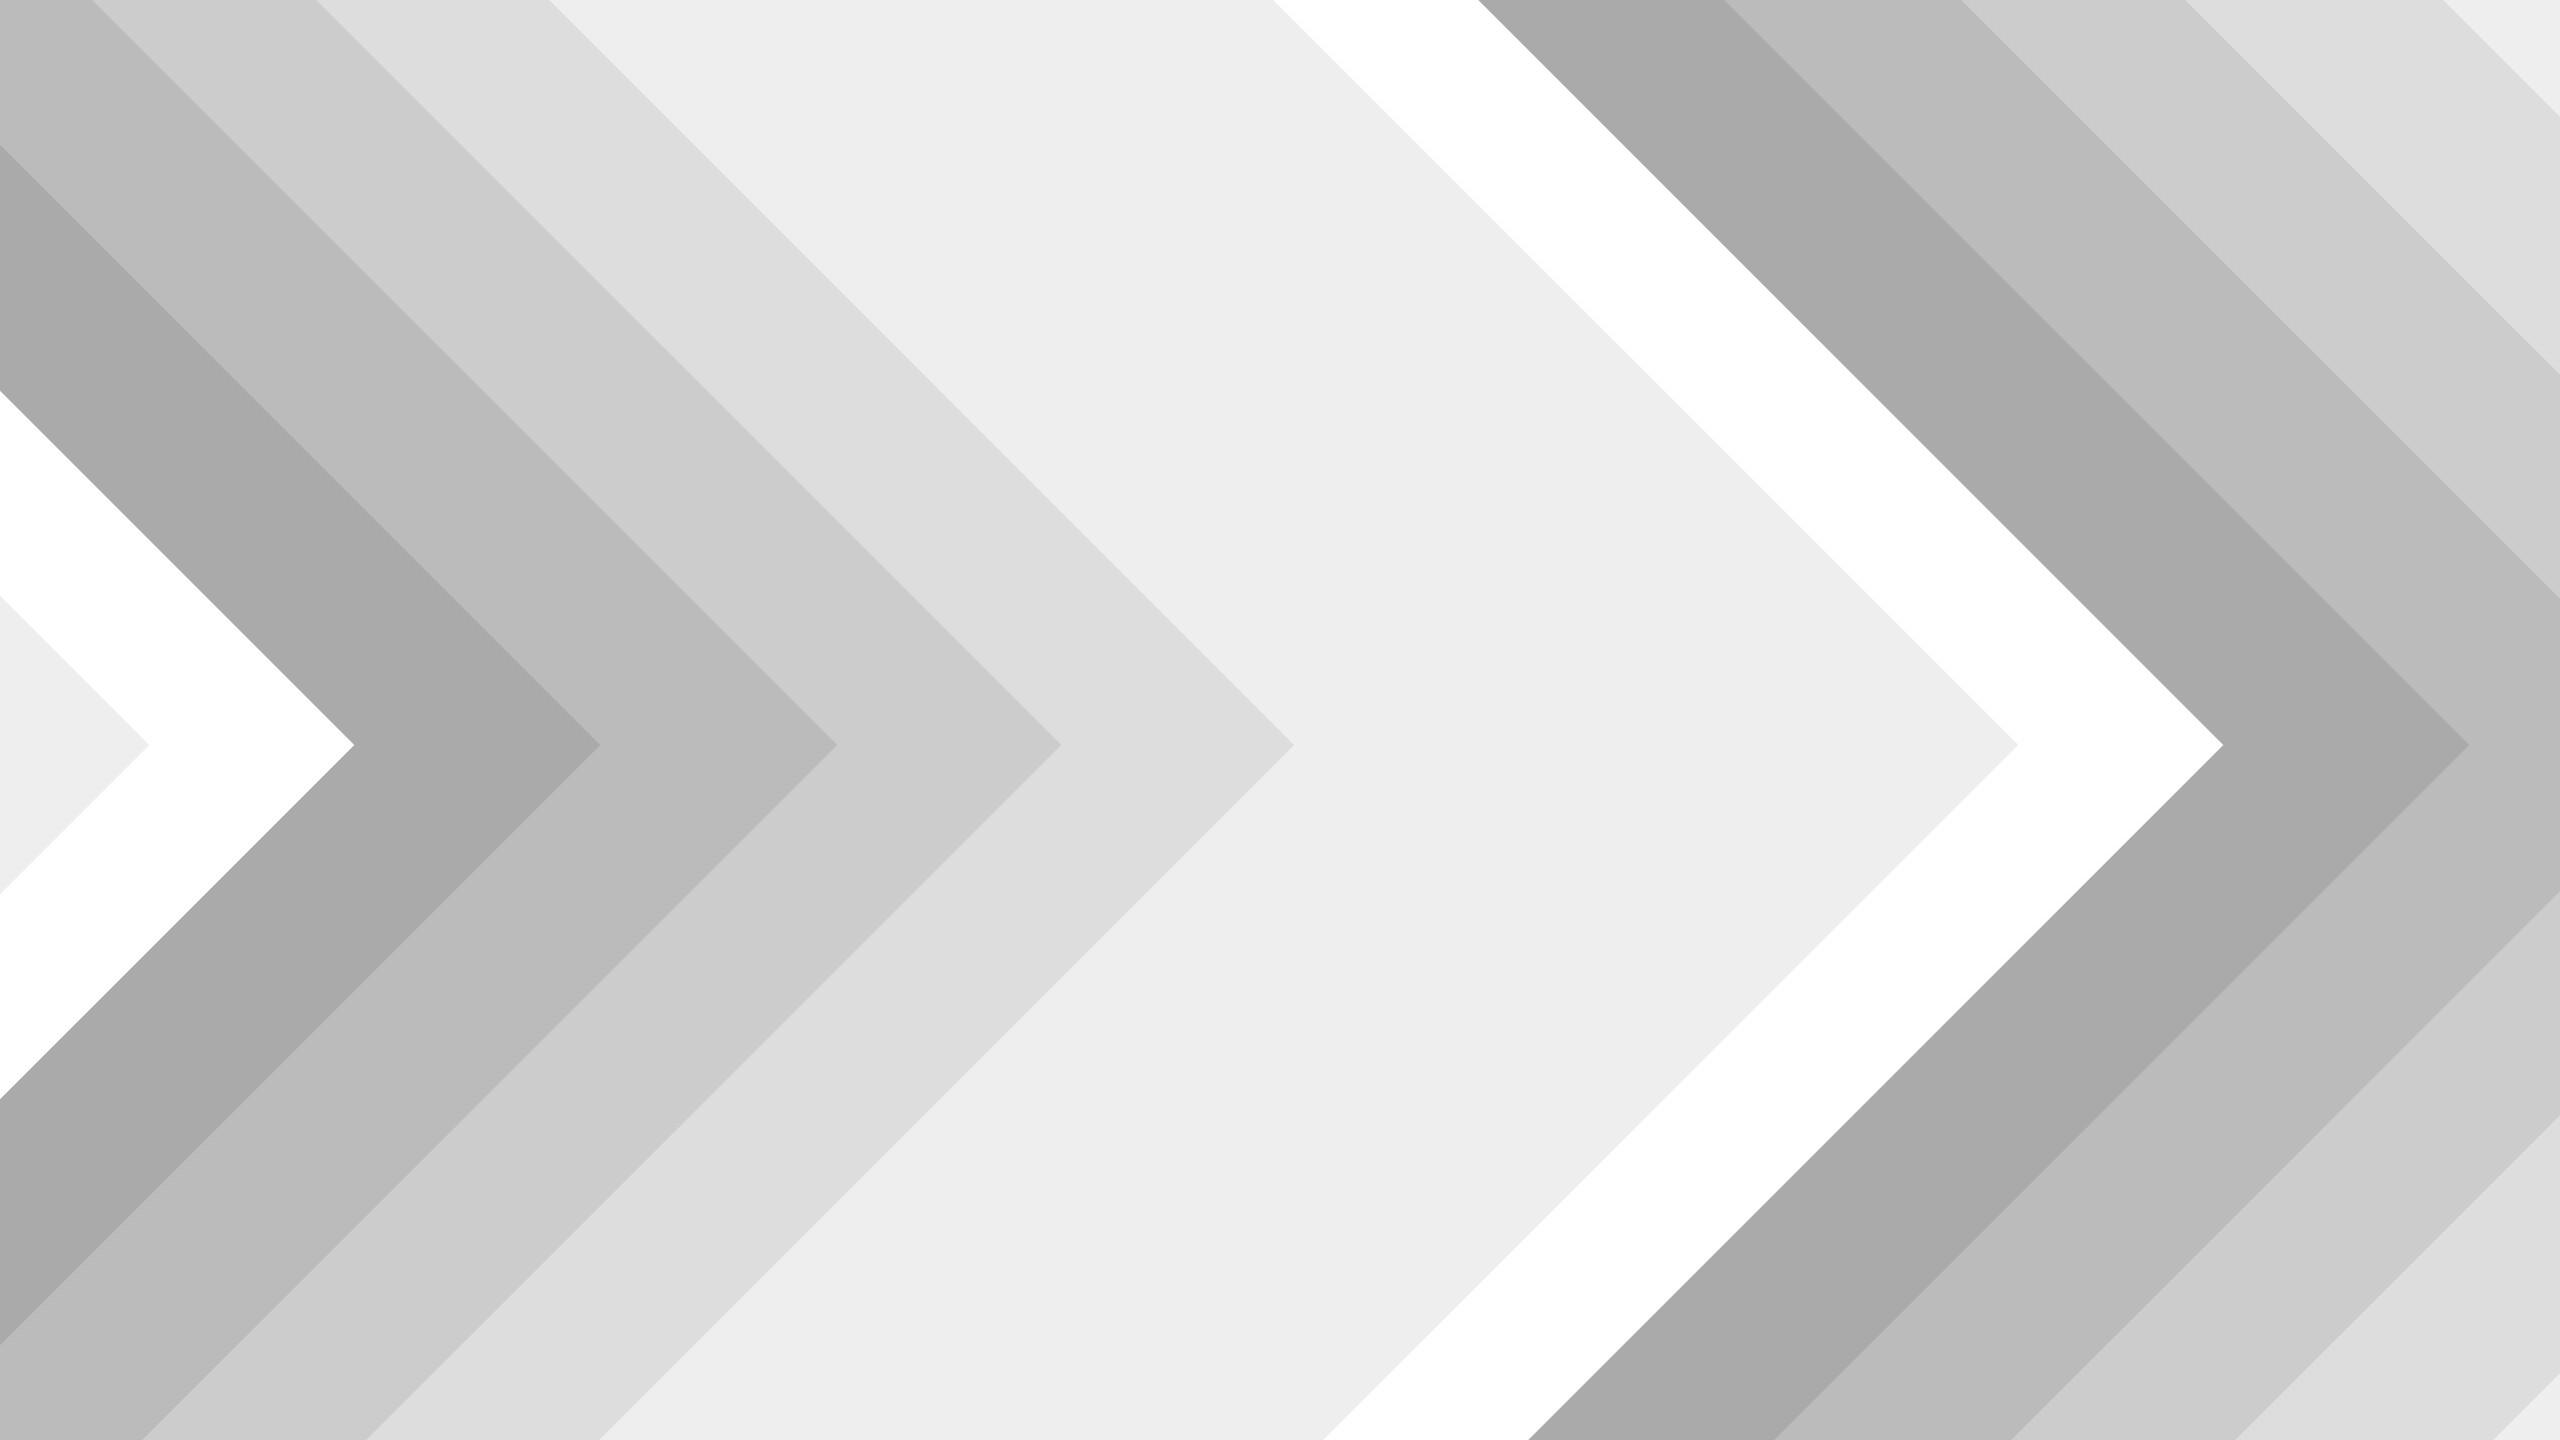 1600x1200 Simple Arrow Path 1600x1200 Resolution Hd 4k Wallpapers